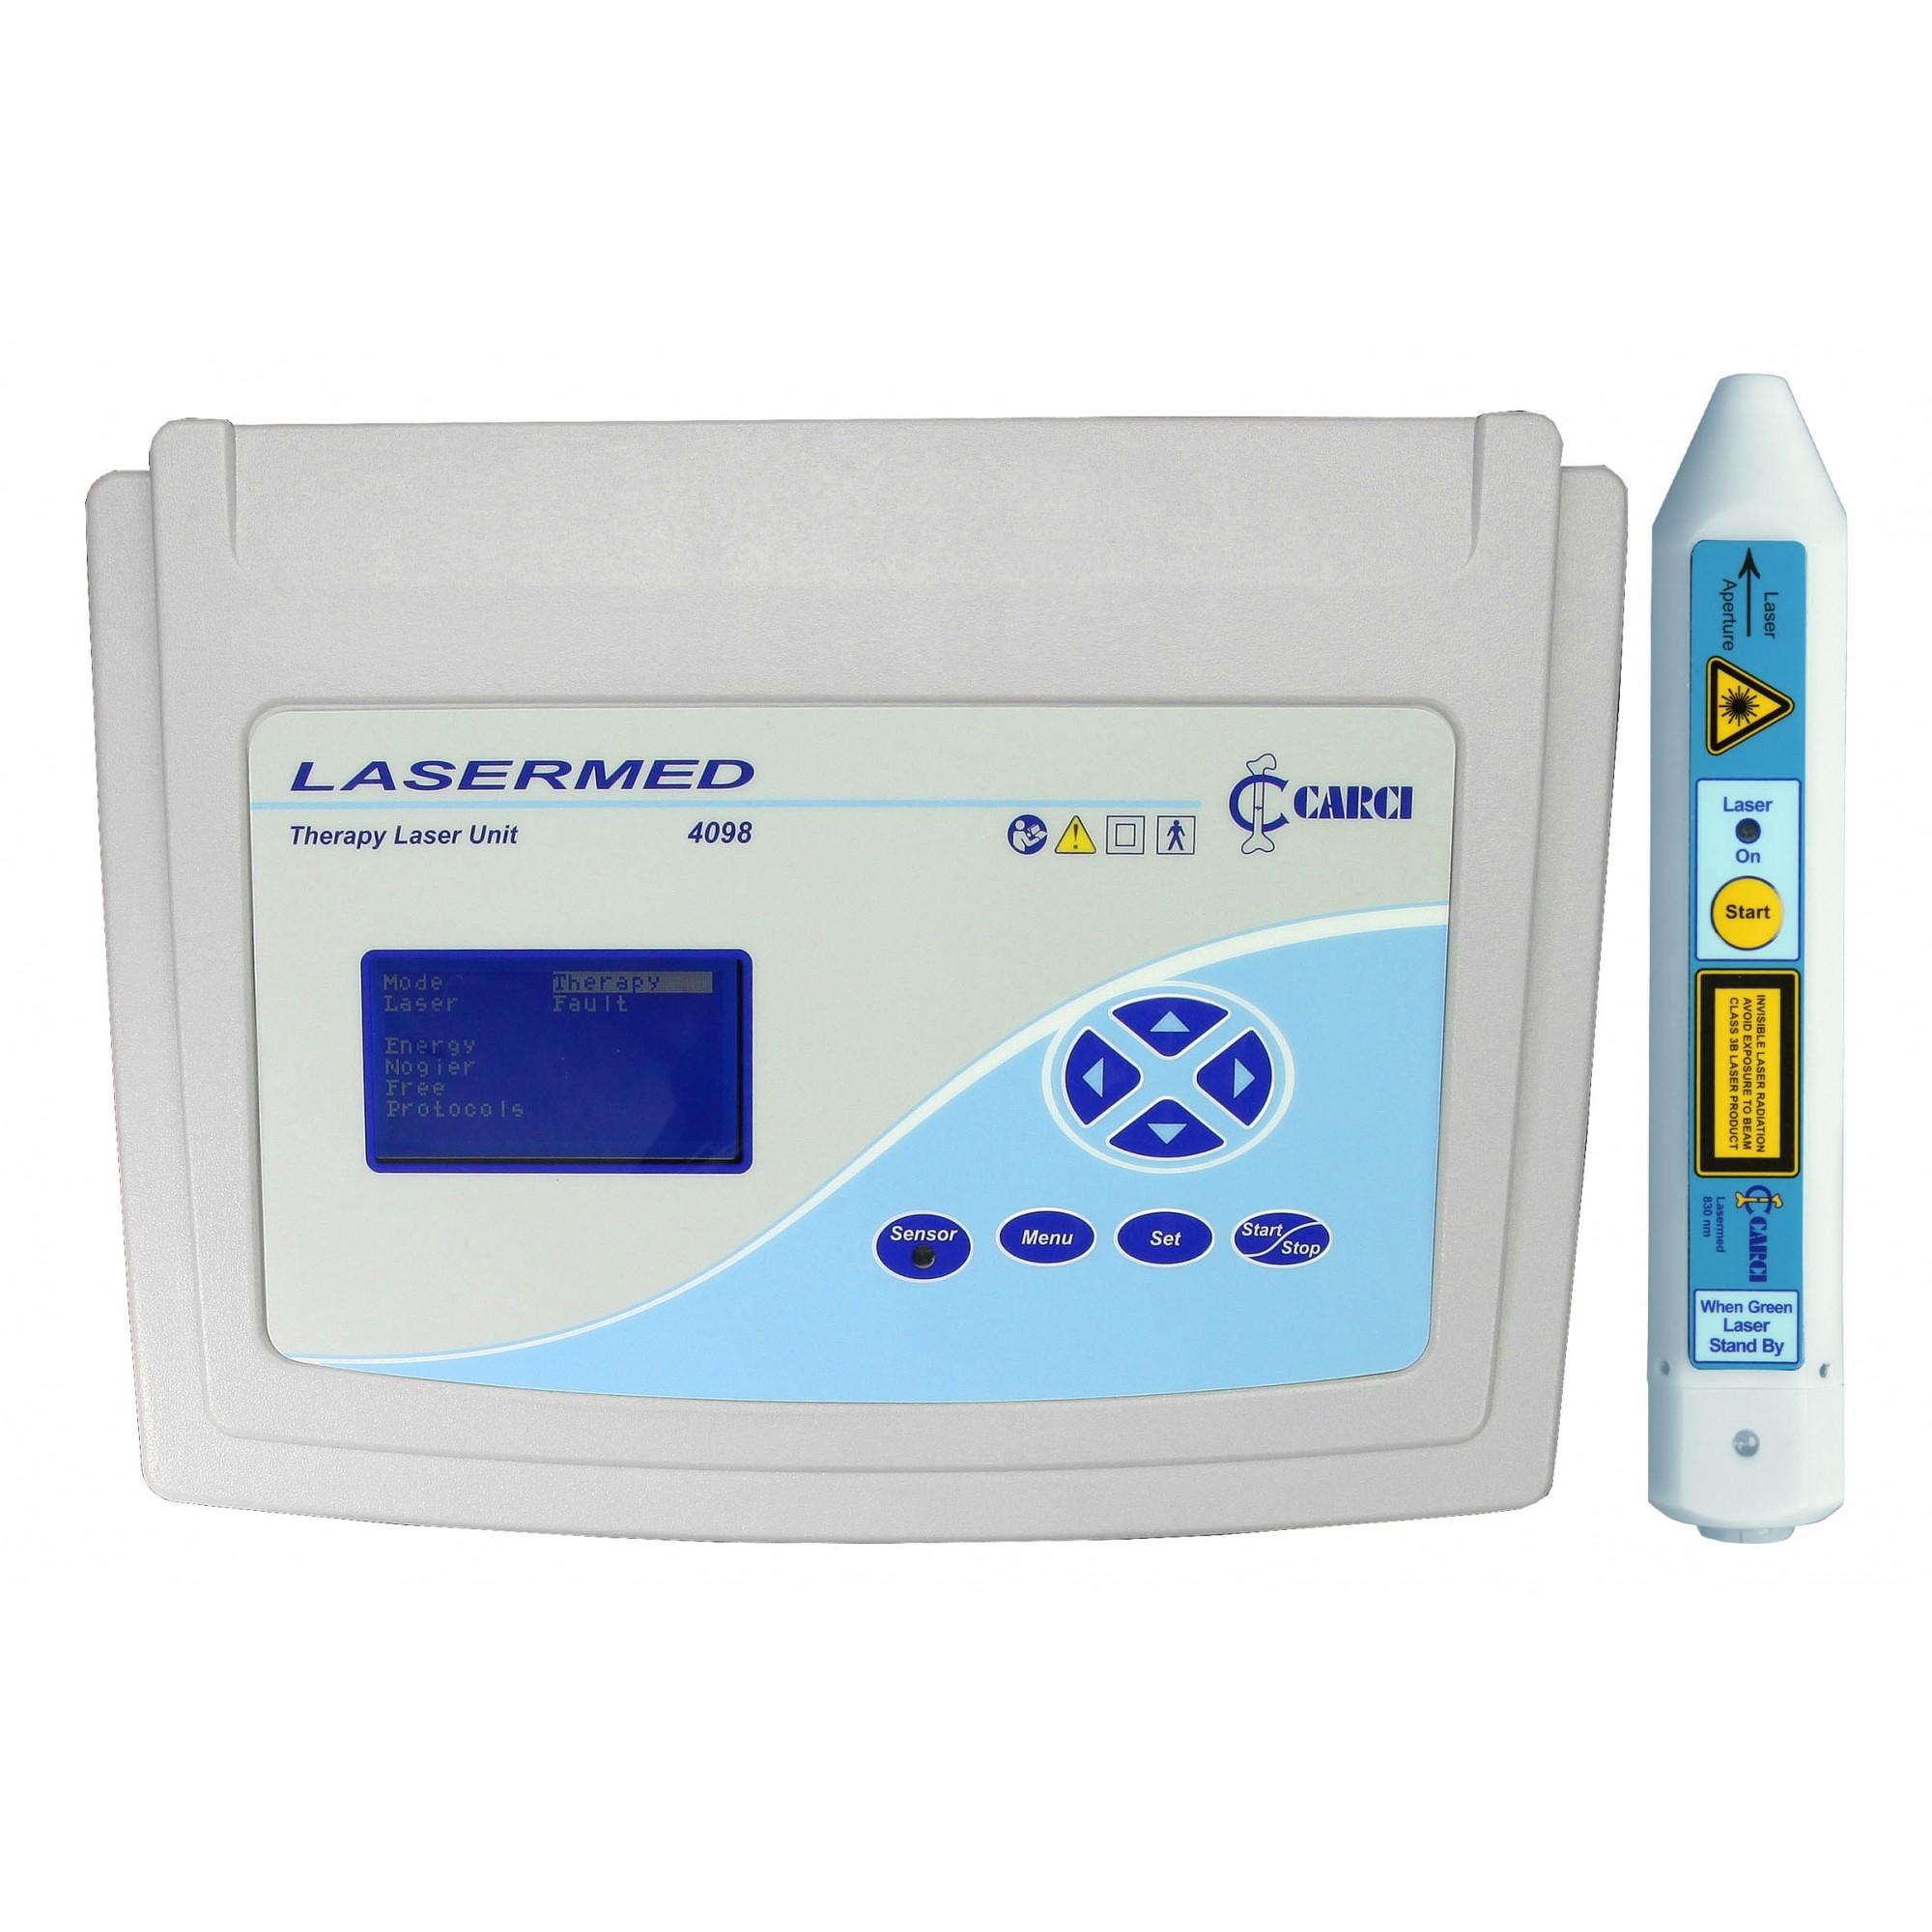 Laser para fisioterapia e caneta 830 nm - 4098+4093